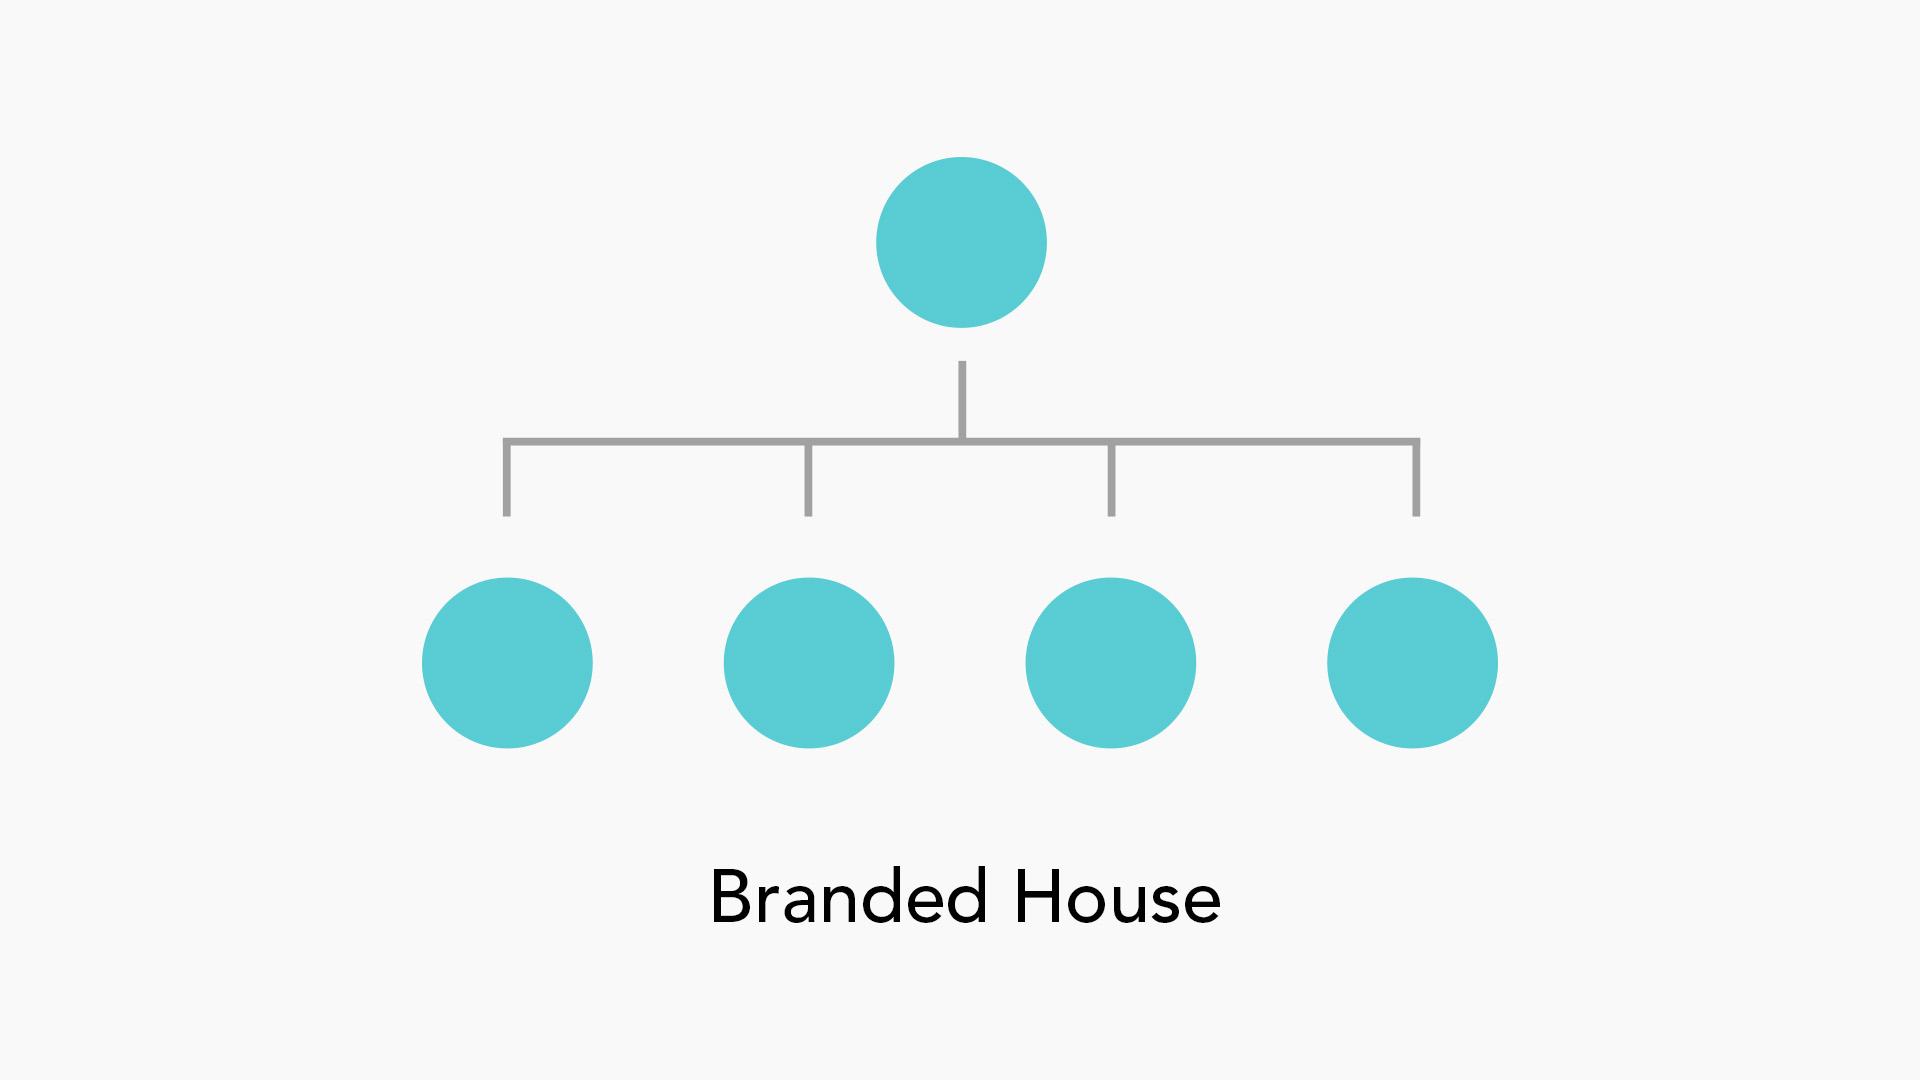 Branded House